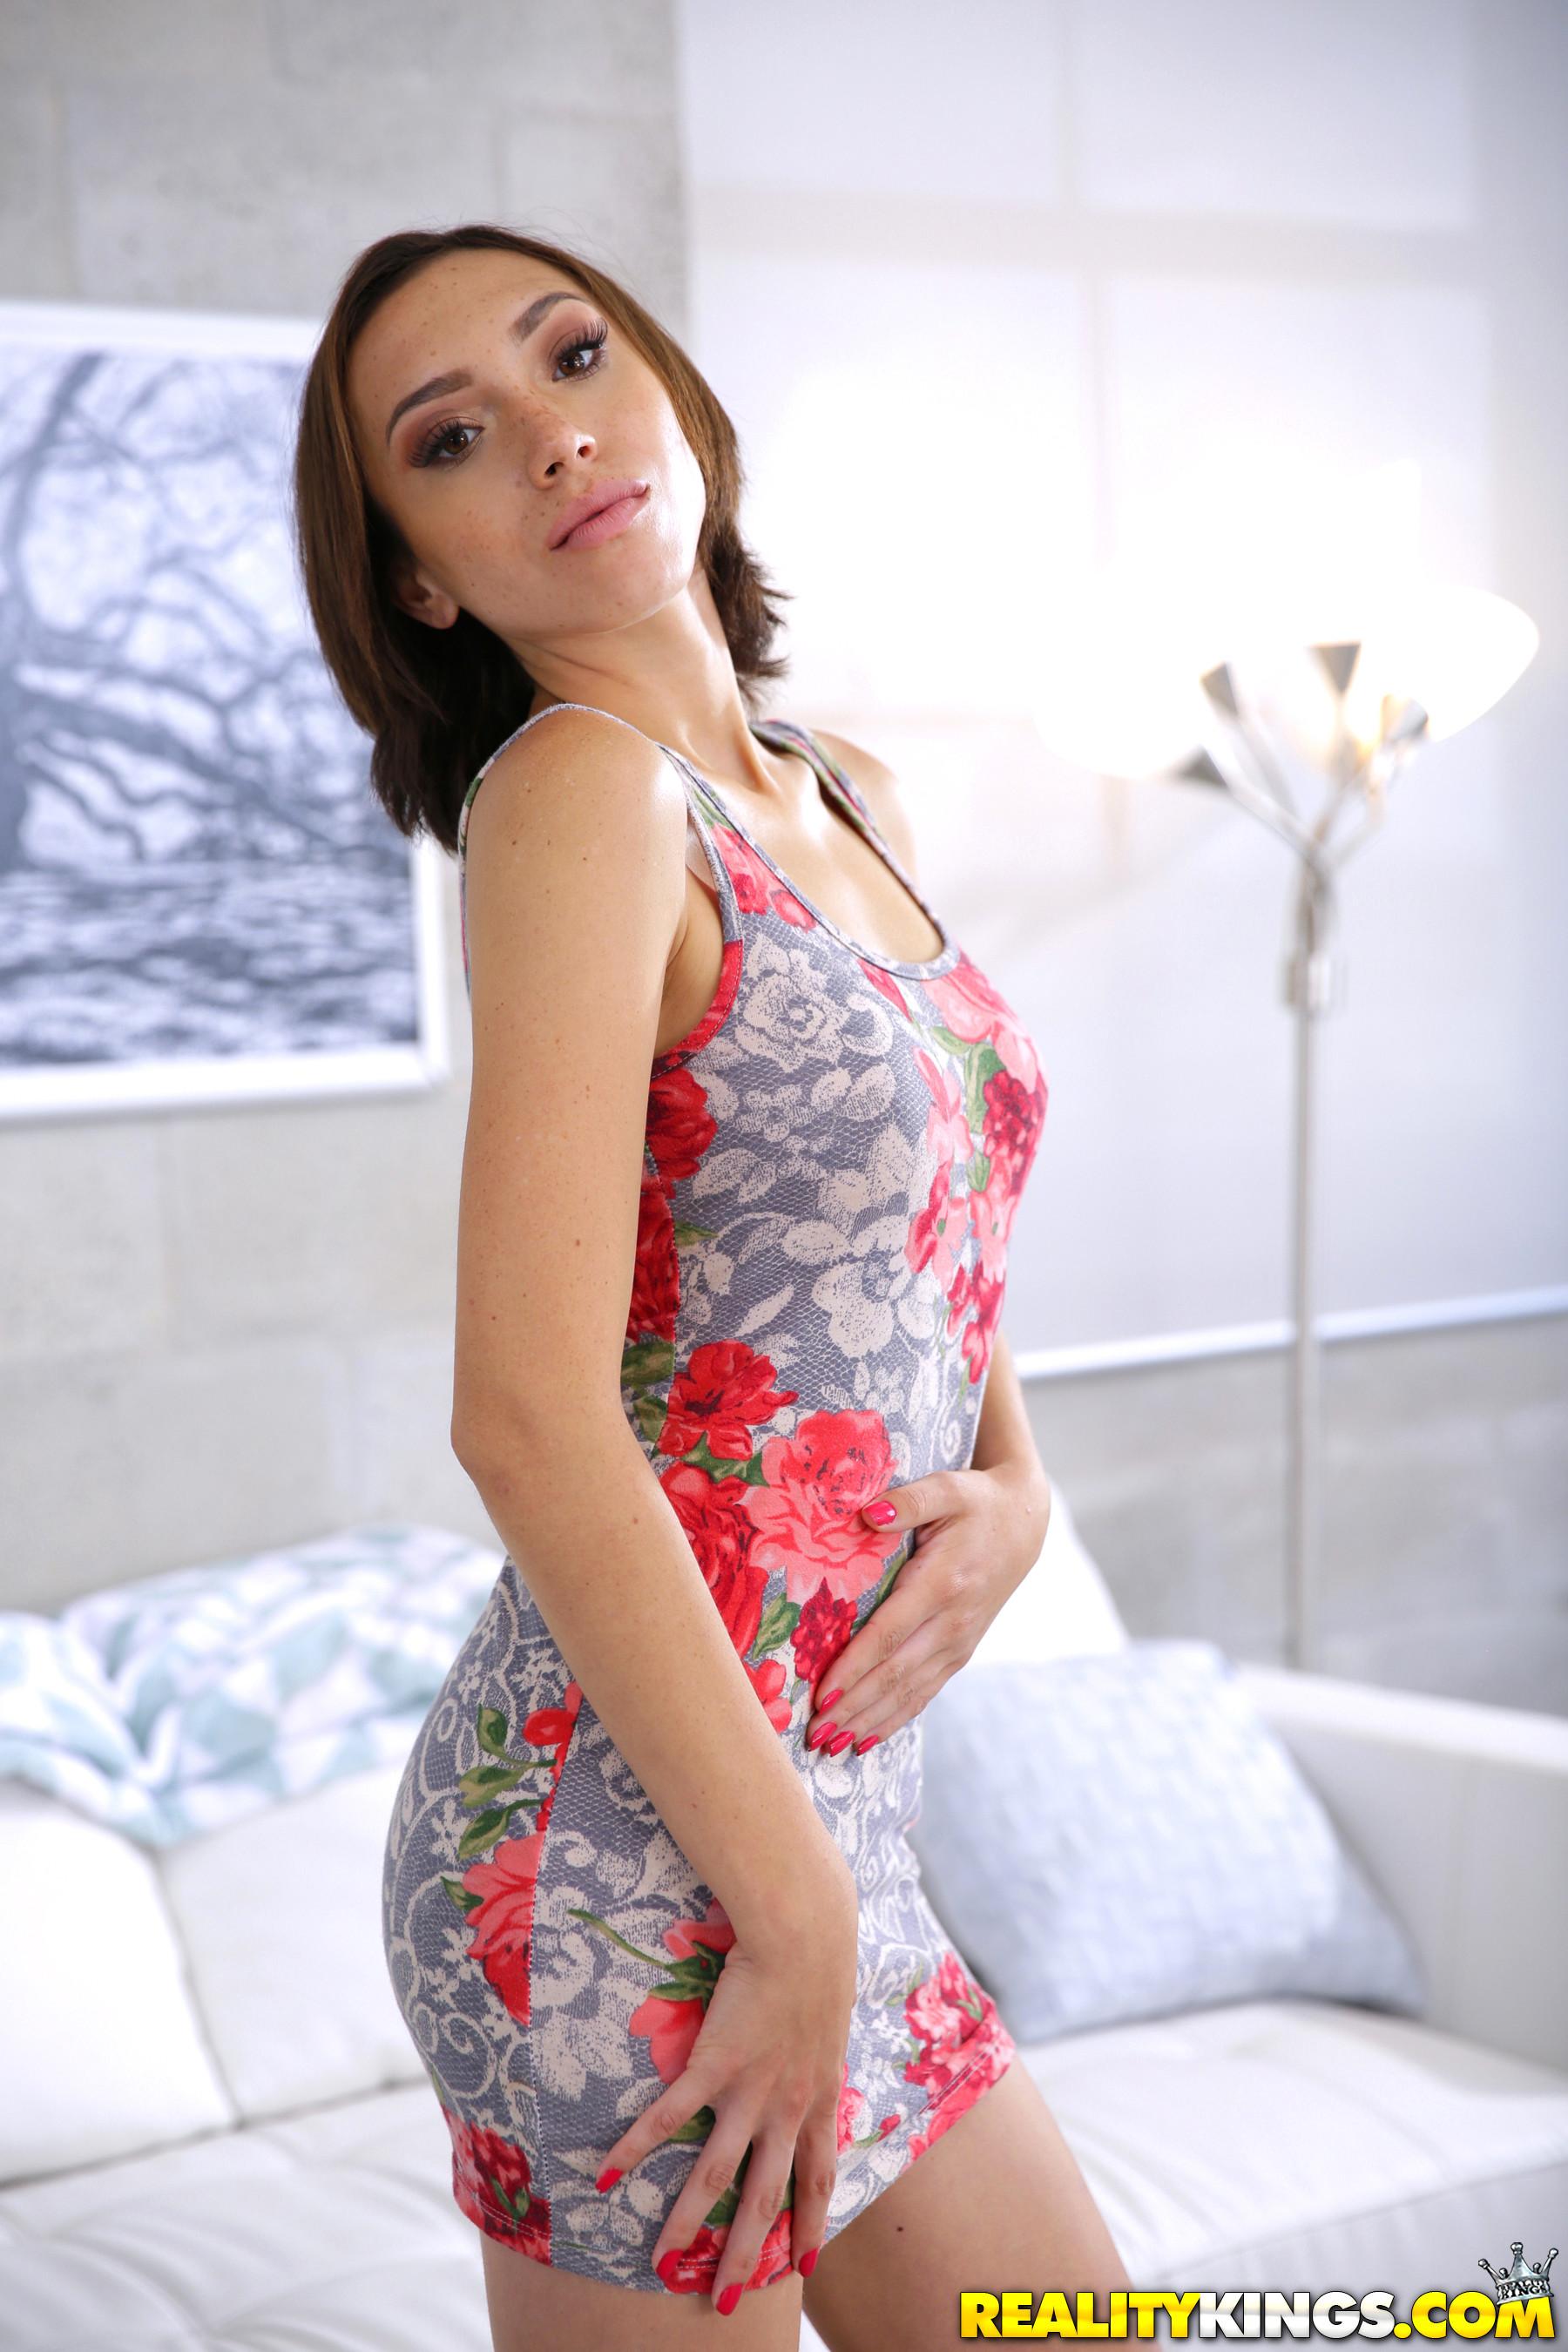 Amber Faye - G String Dream - 8Th Street Latinas 87725-2046